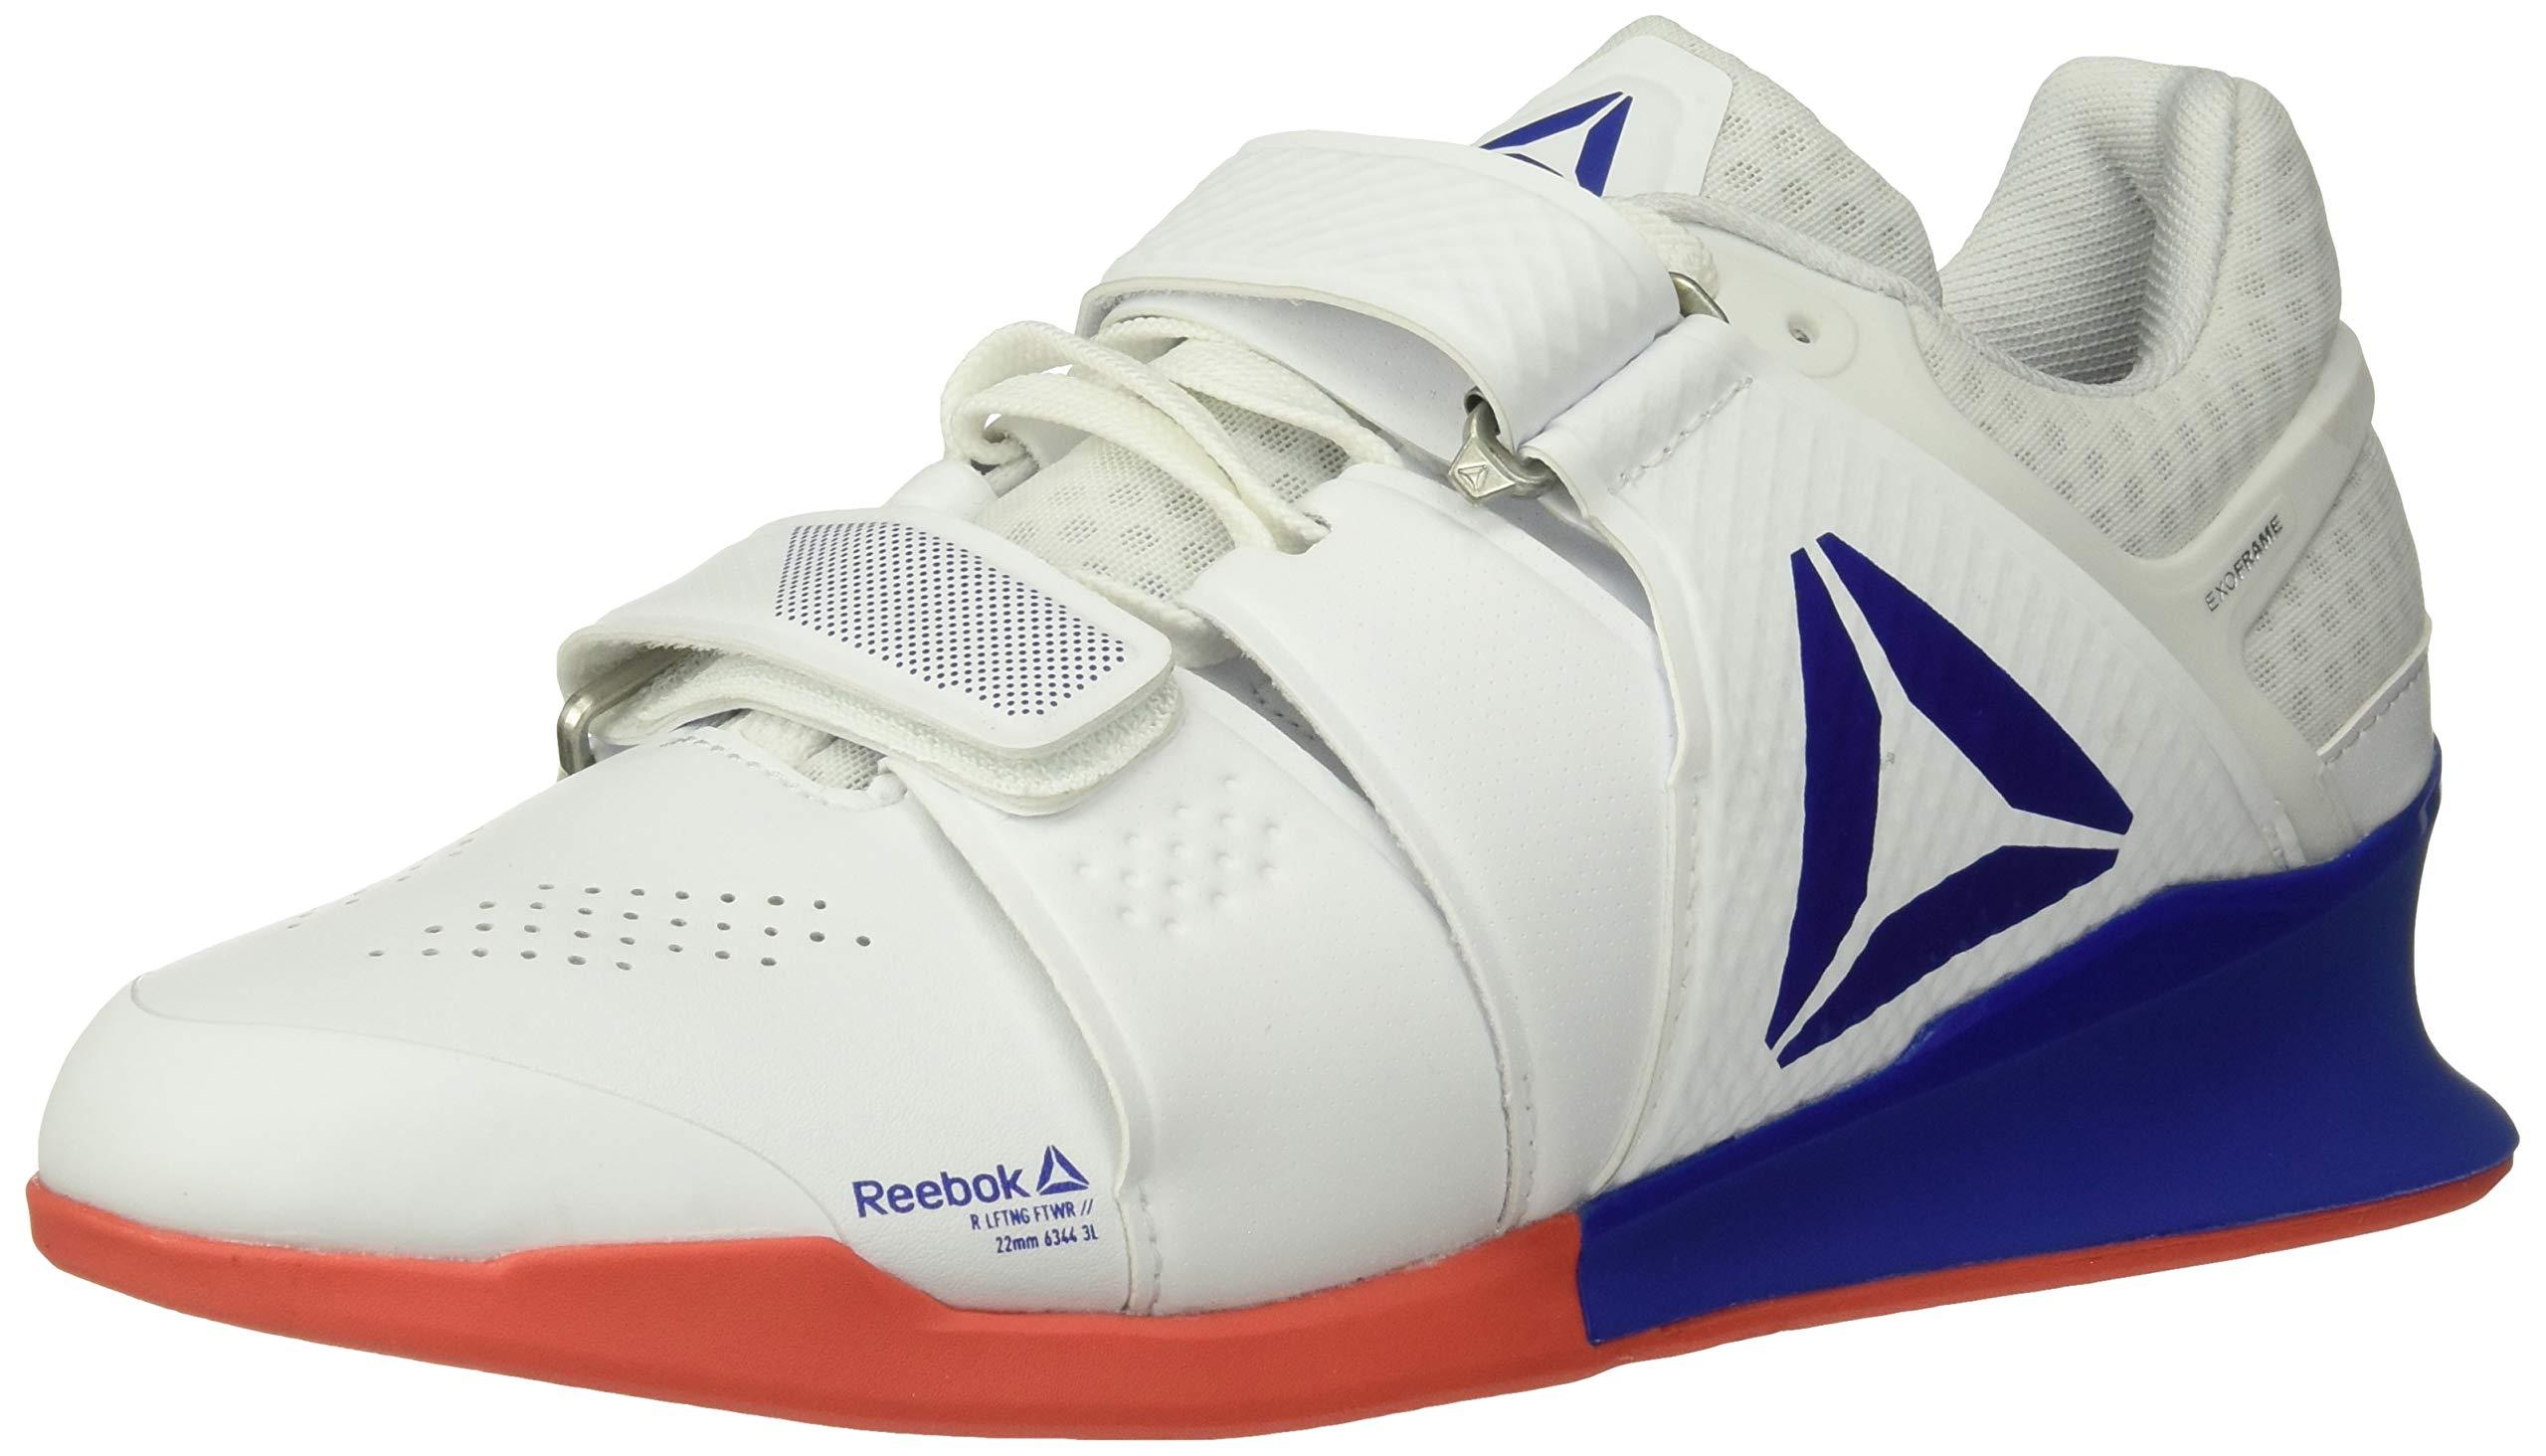 Reebok Men's Legacylifter Cross Trainer, White/Cobalt/Rosette, 8.5 M US by Reebok